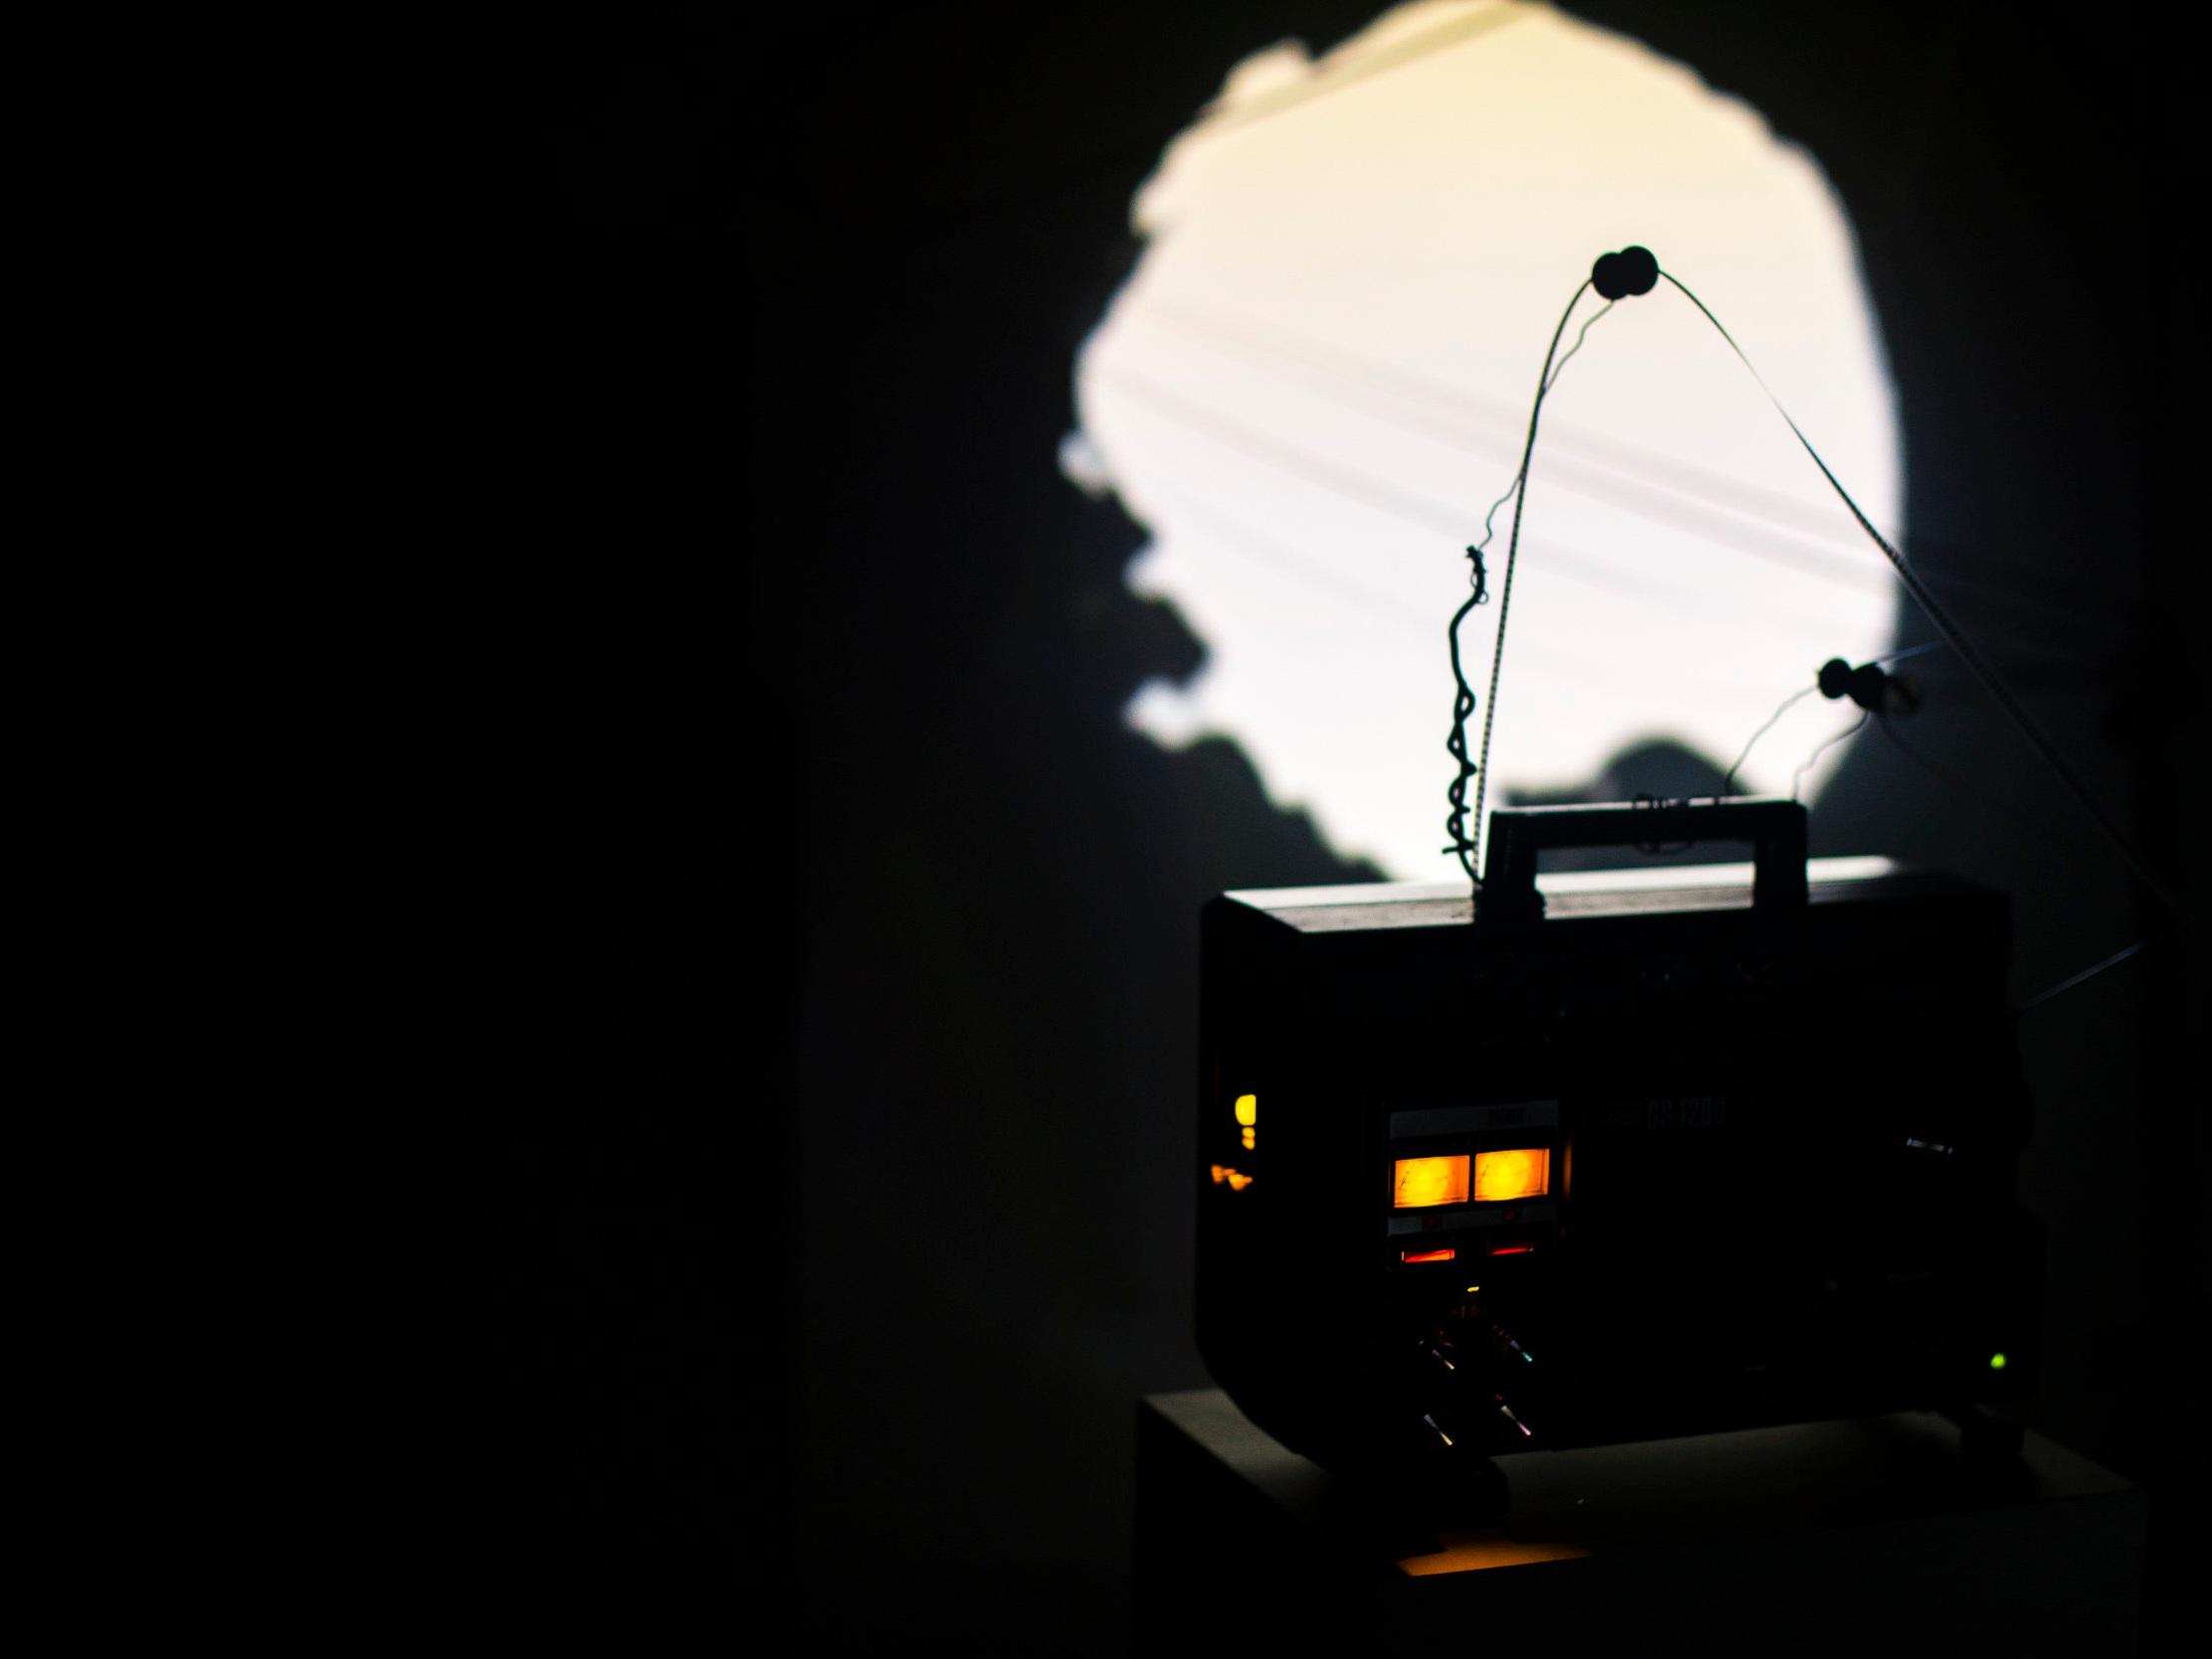 15-17.02.2019 - HOOMAN JEDDY - 'BEELDBUITENKADER'EXPO